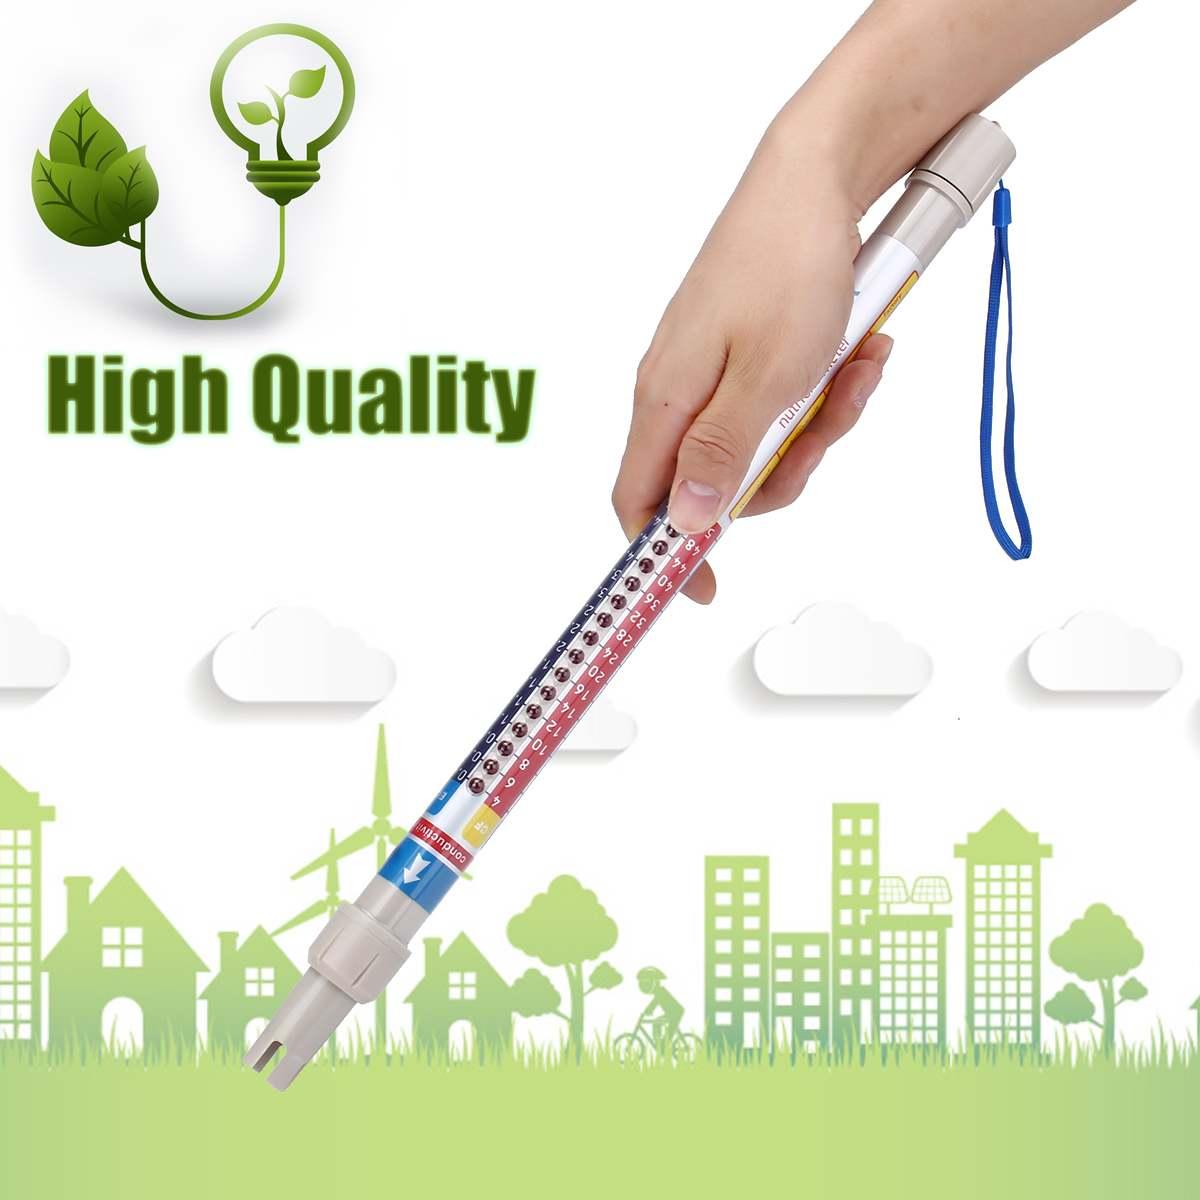 CF Meter PPM BRAND NEW Nutrient Wand Hydroponic Nutrient Measurement EC